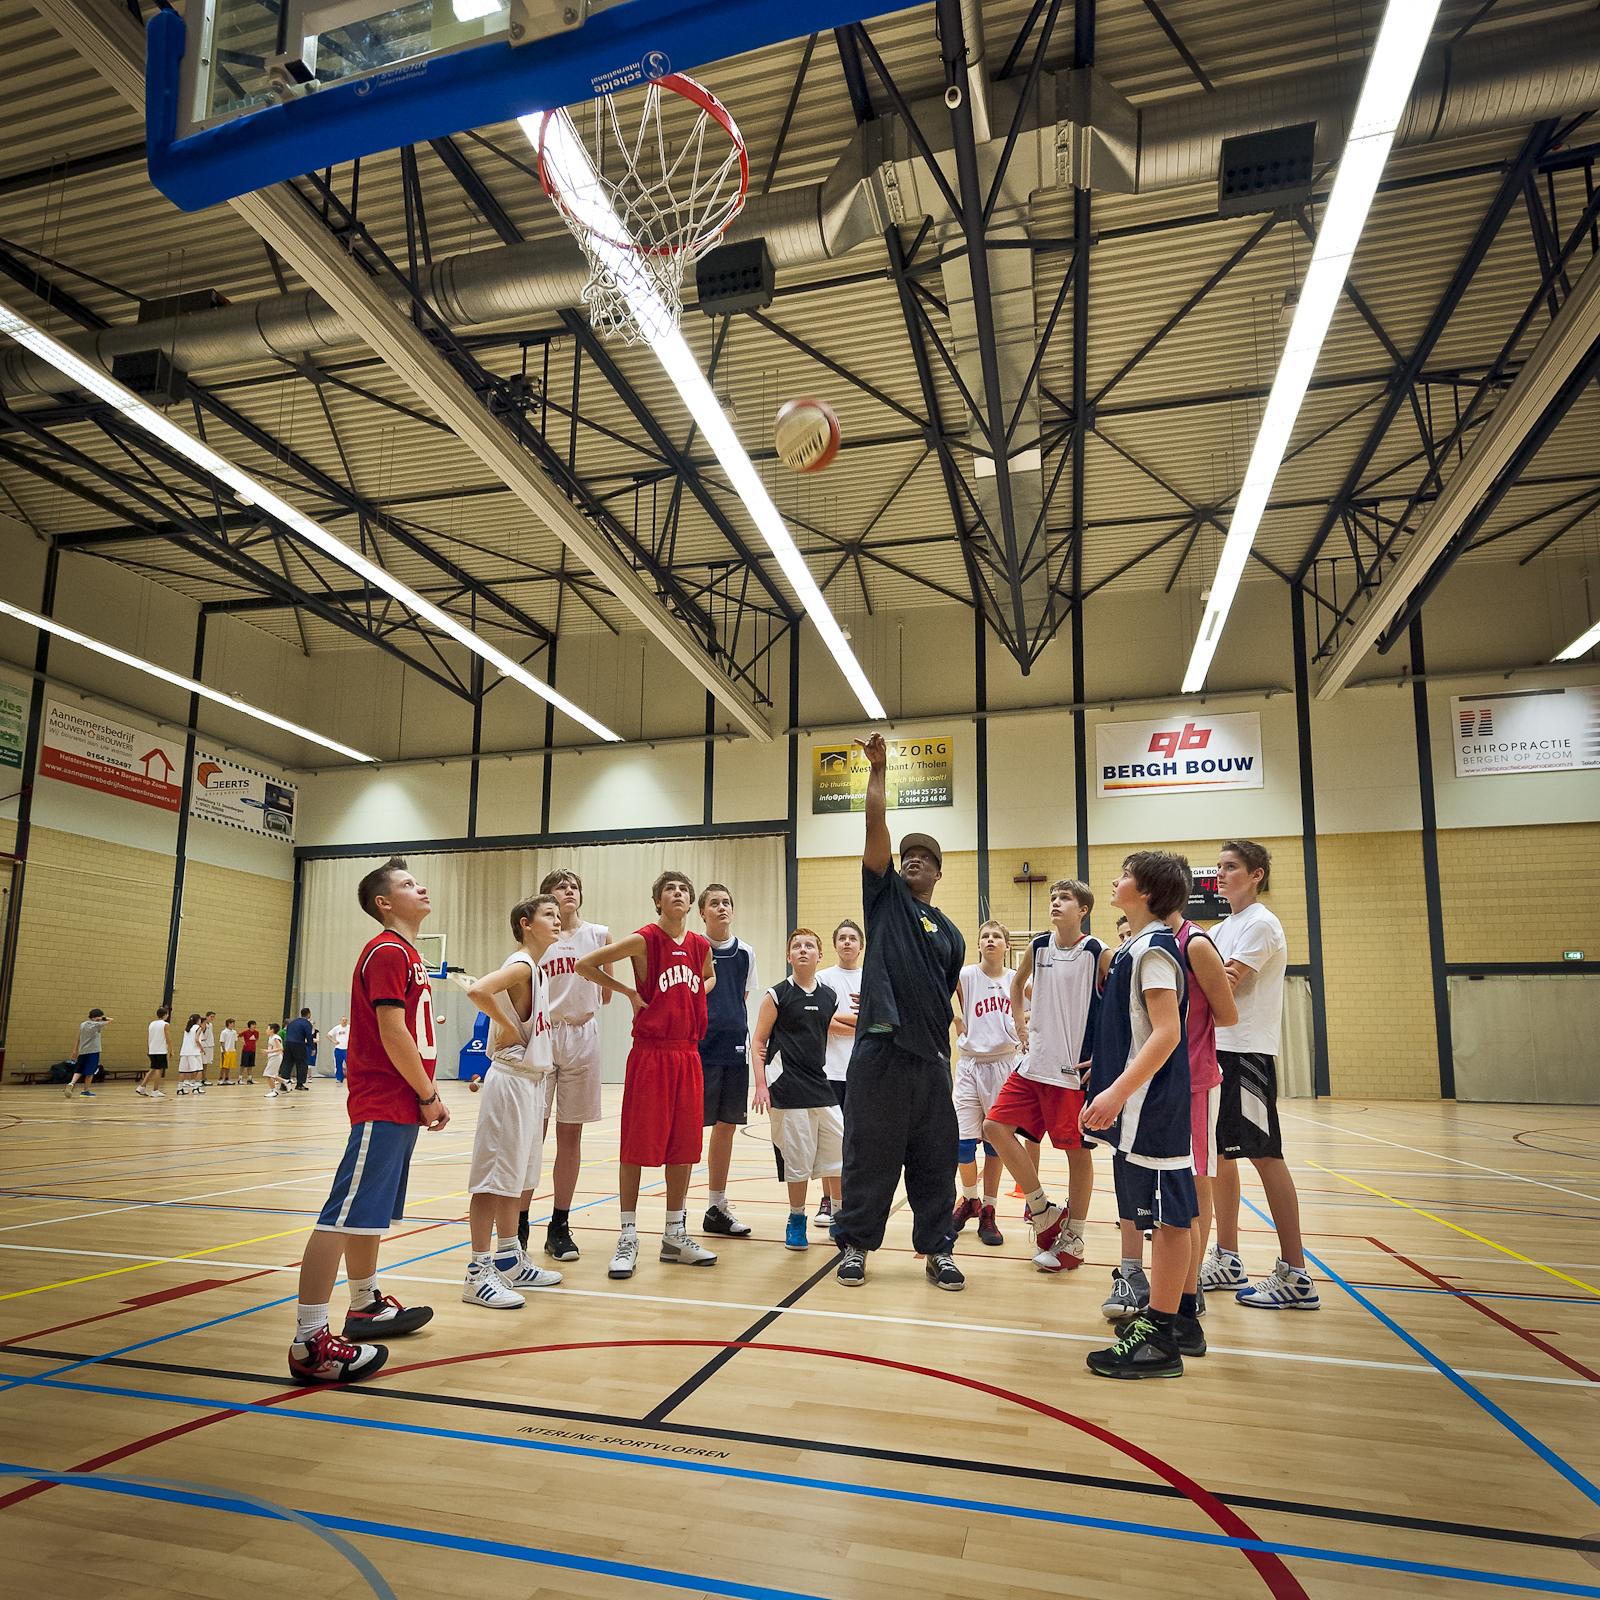 Fundamental-Basketball-Kamp-Giants-Fundamental-Basketball-Kamp-Giants-Academy-3